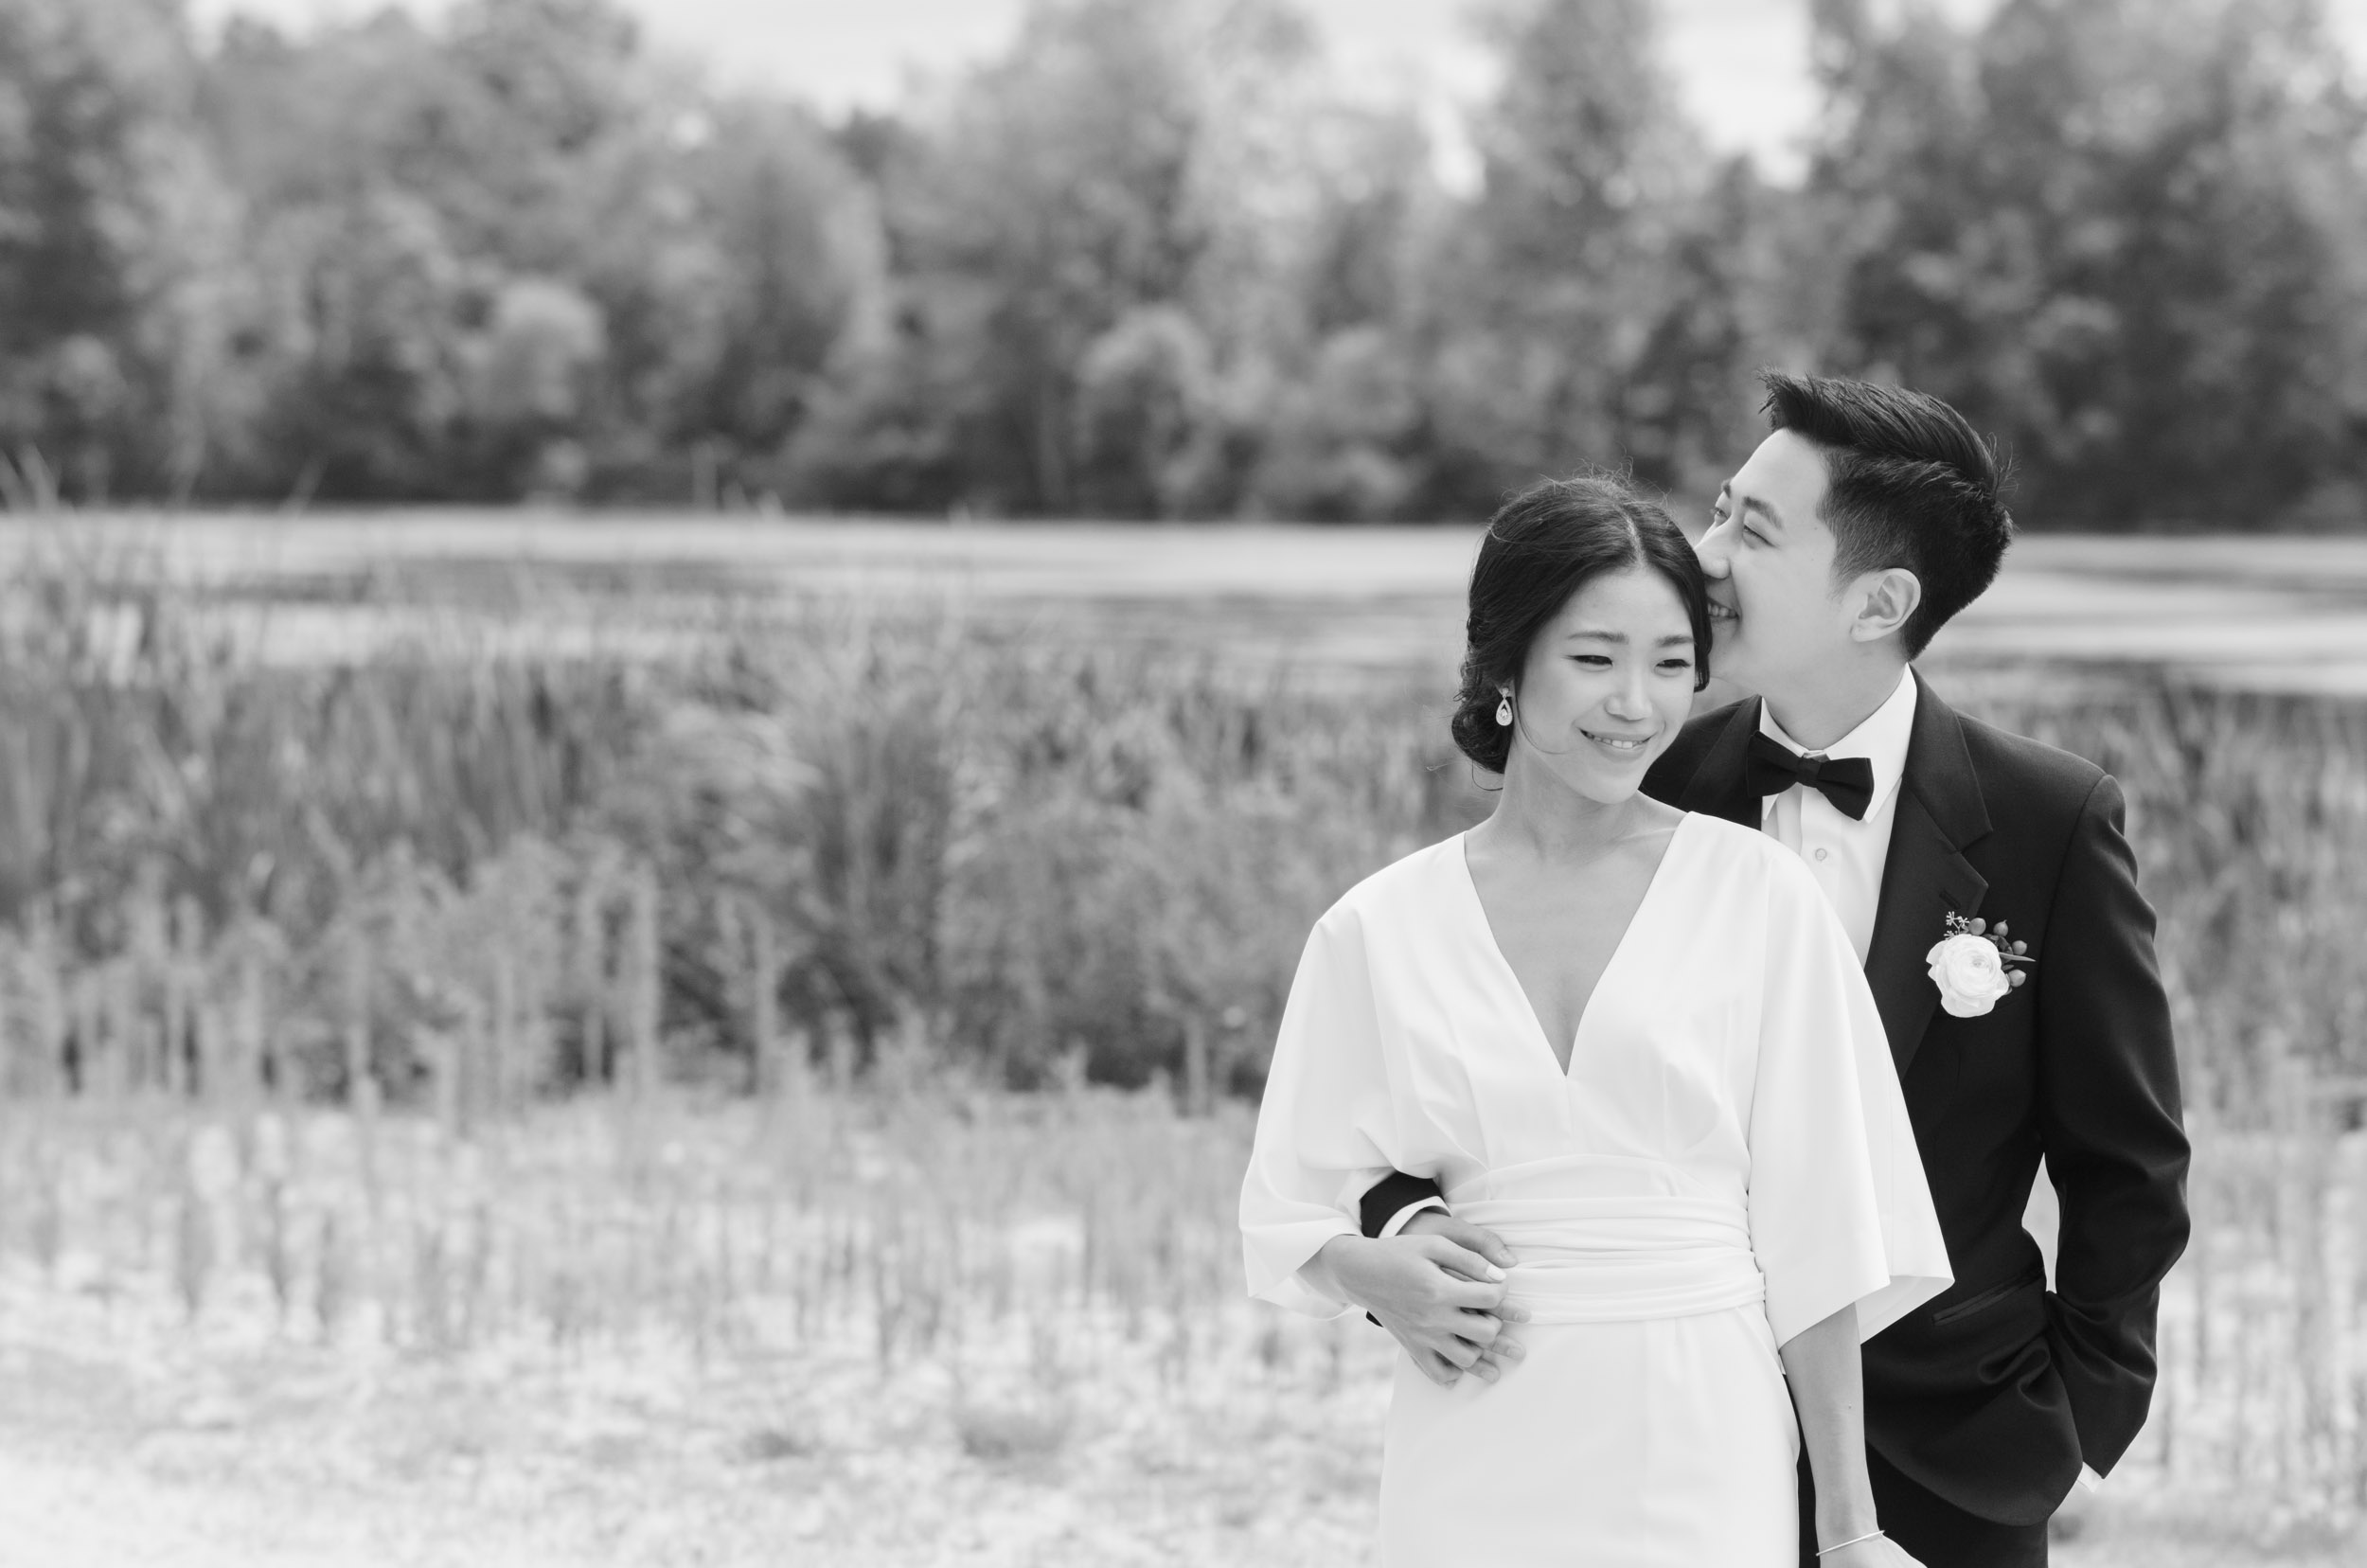 jean-arnold-wedding-0009.jpg